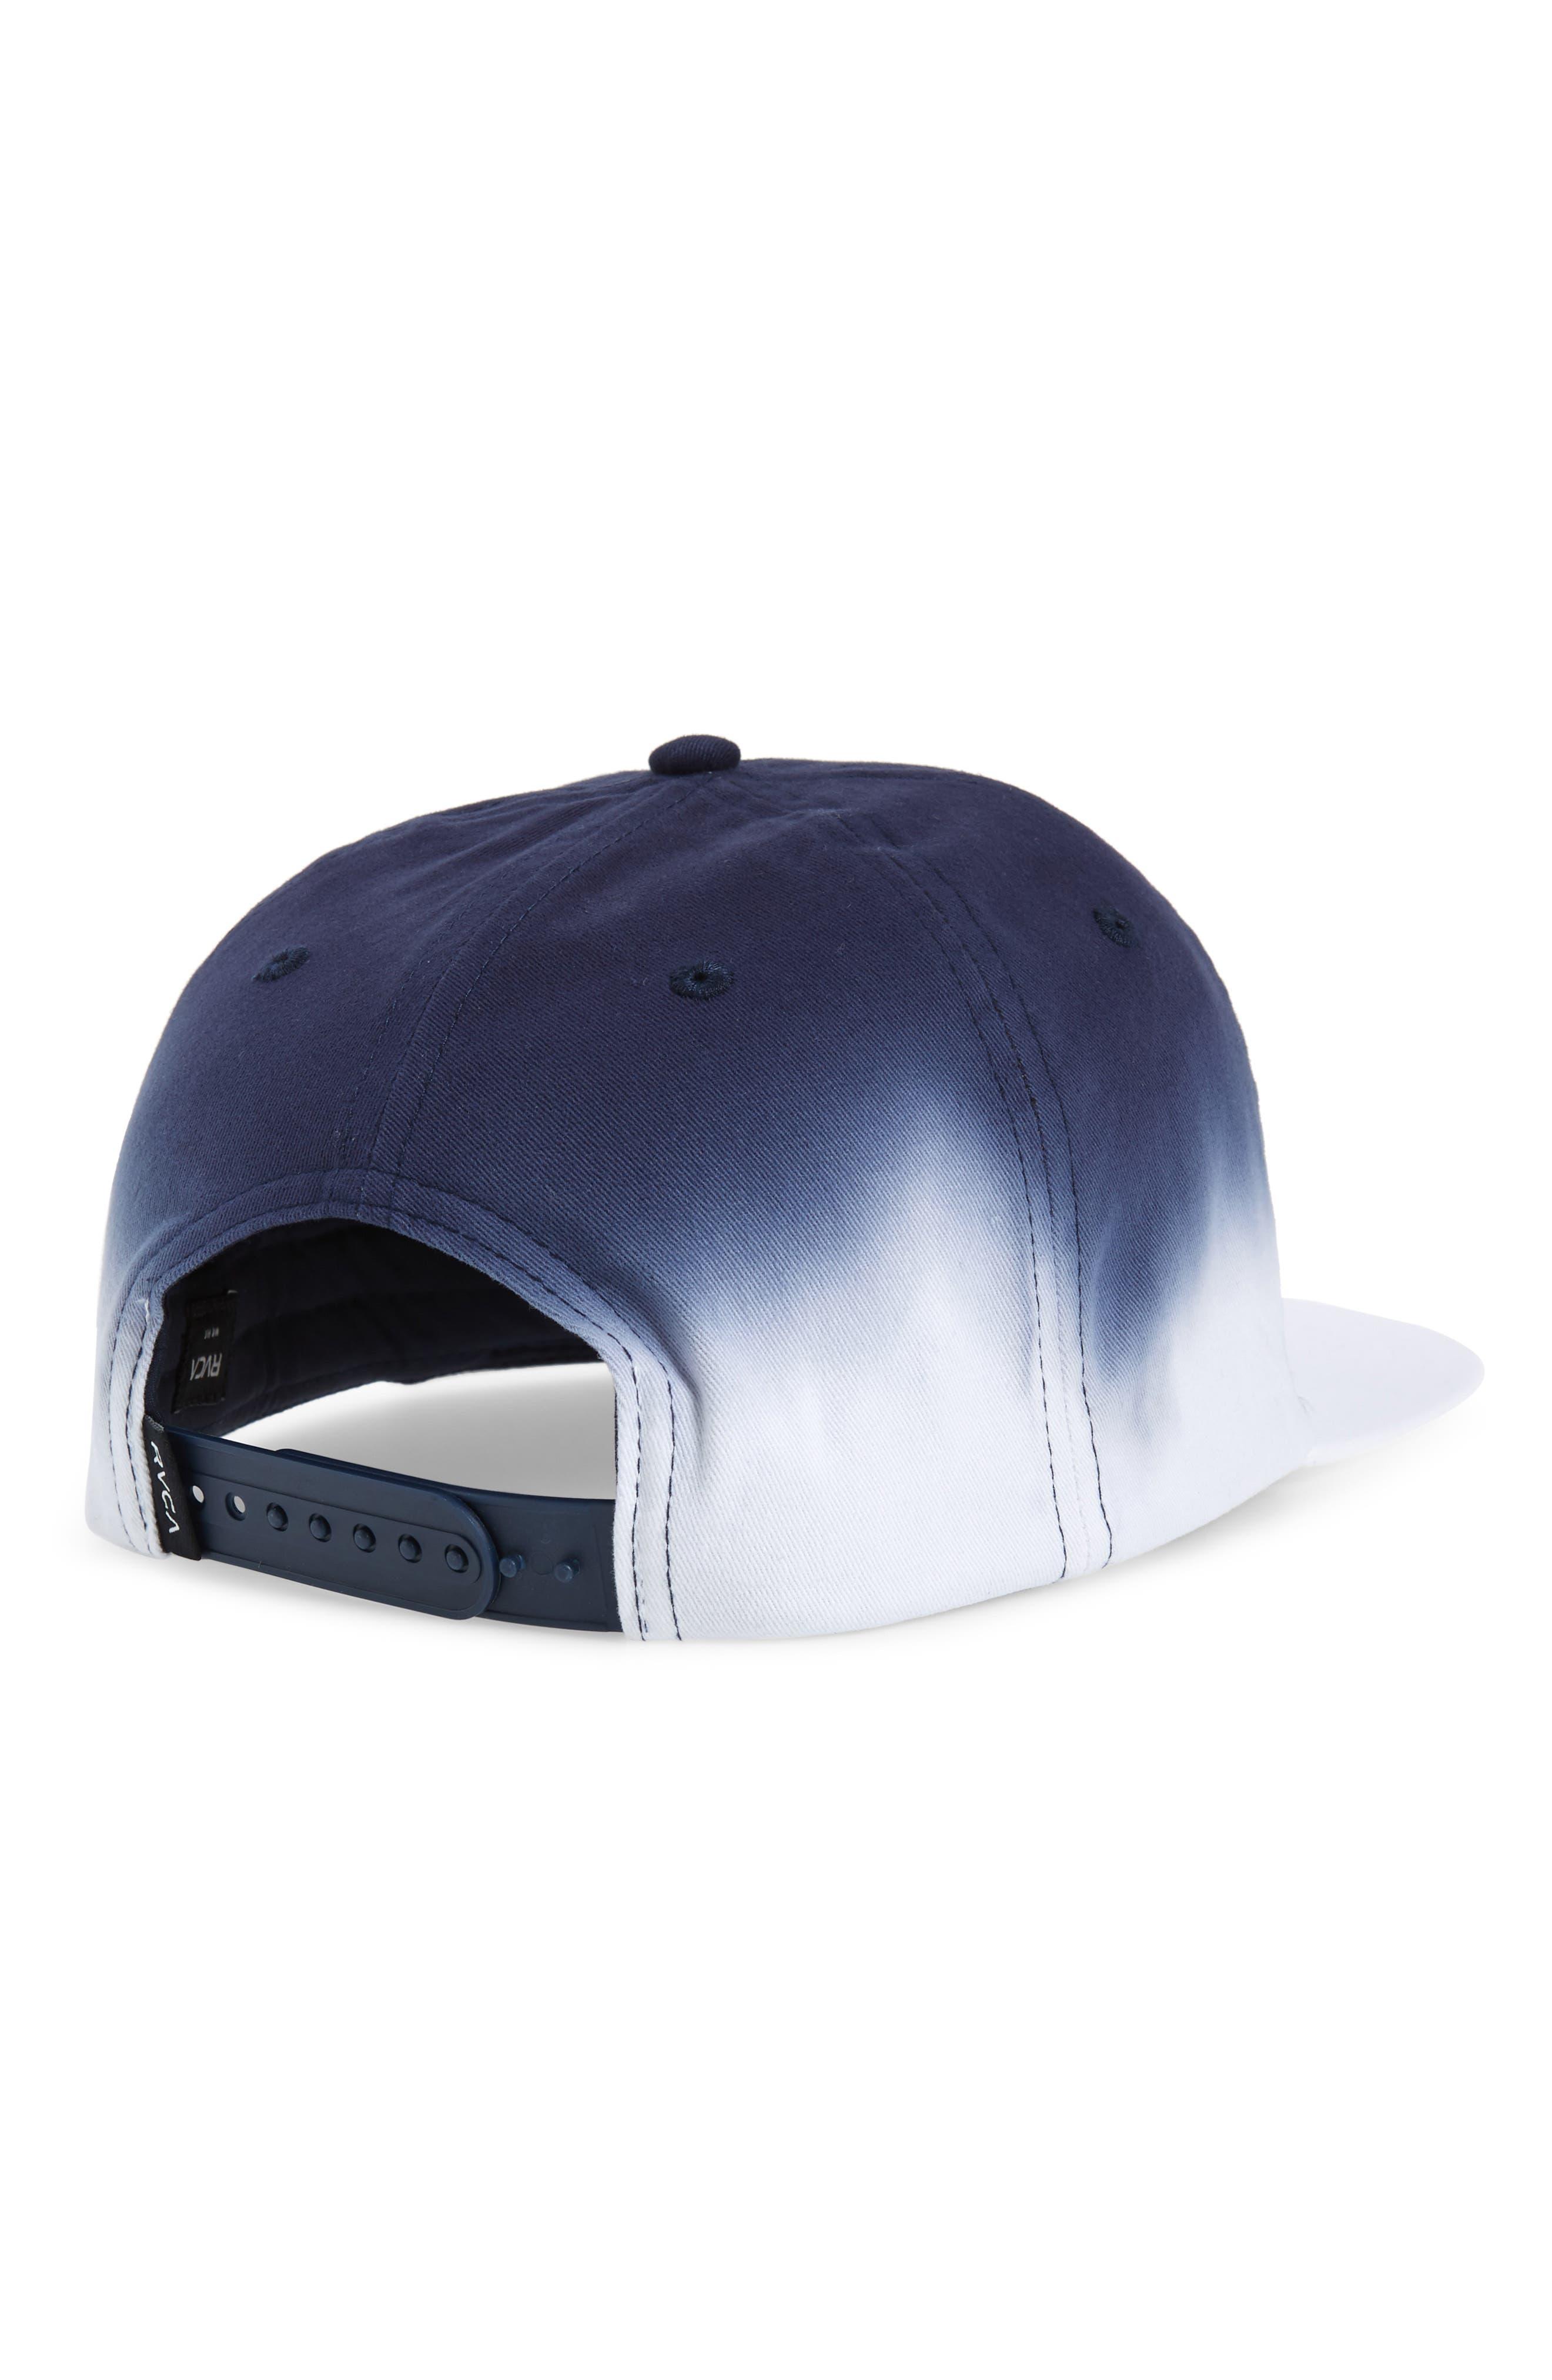 Dip Snapback Baseball Cap,                             Alternate thumbnail 2, color,                             WHITE/ BLUE